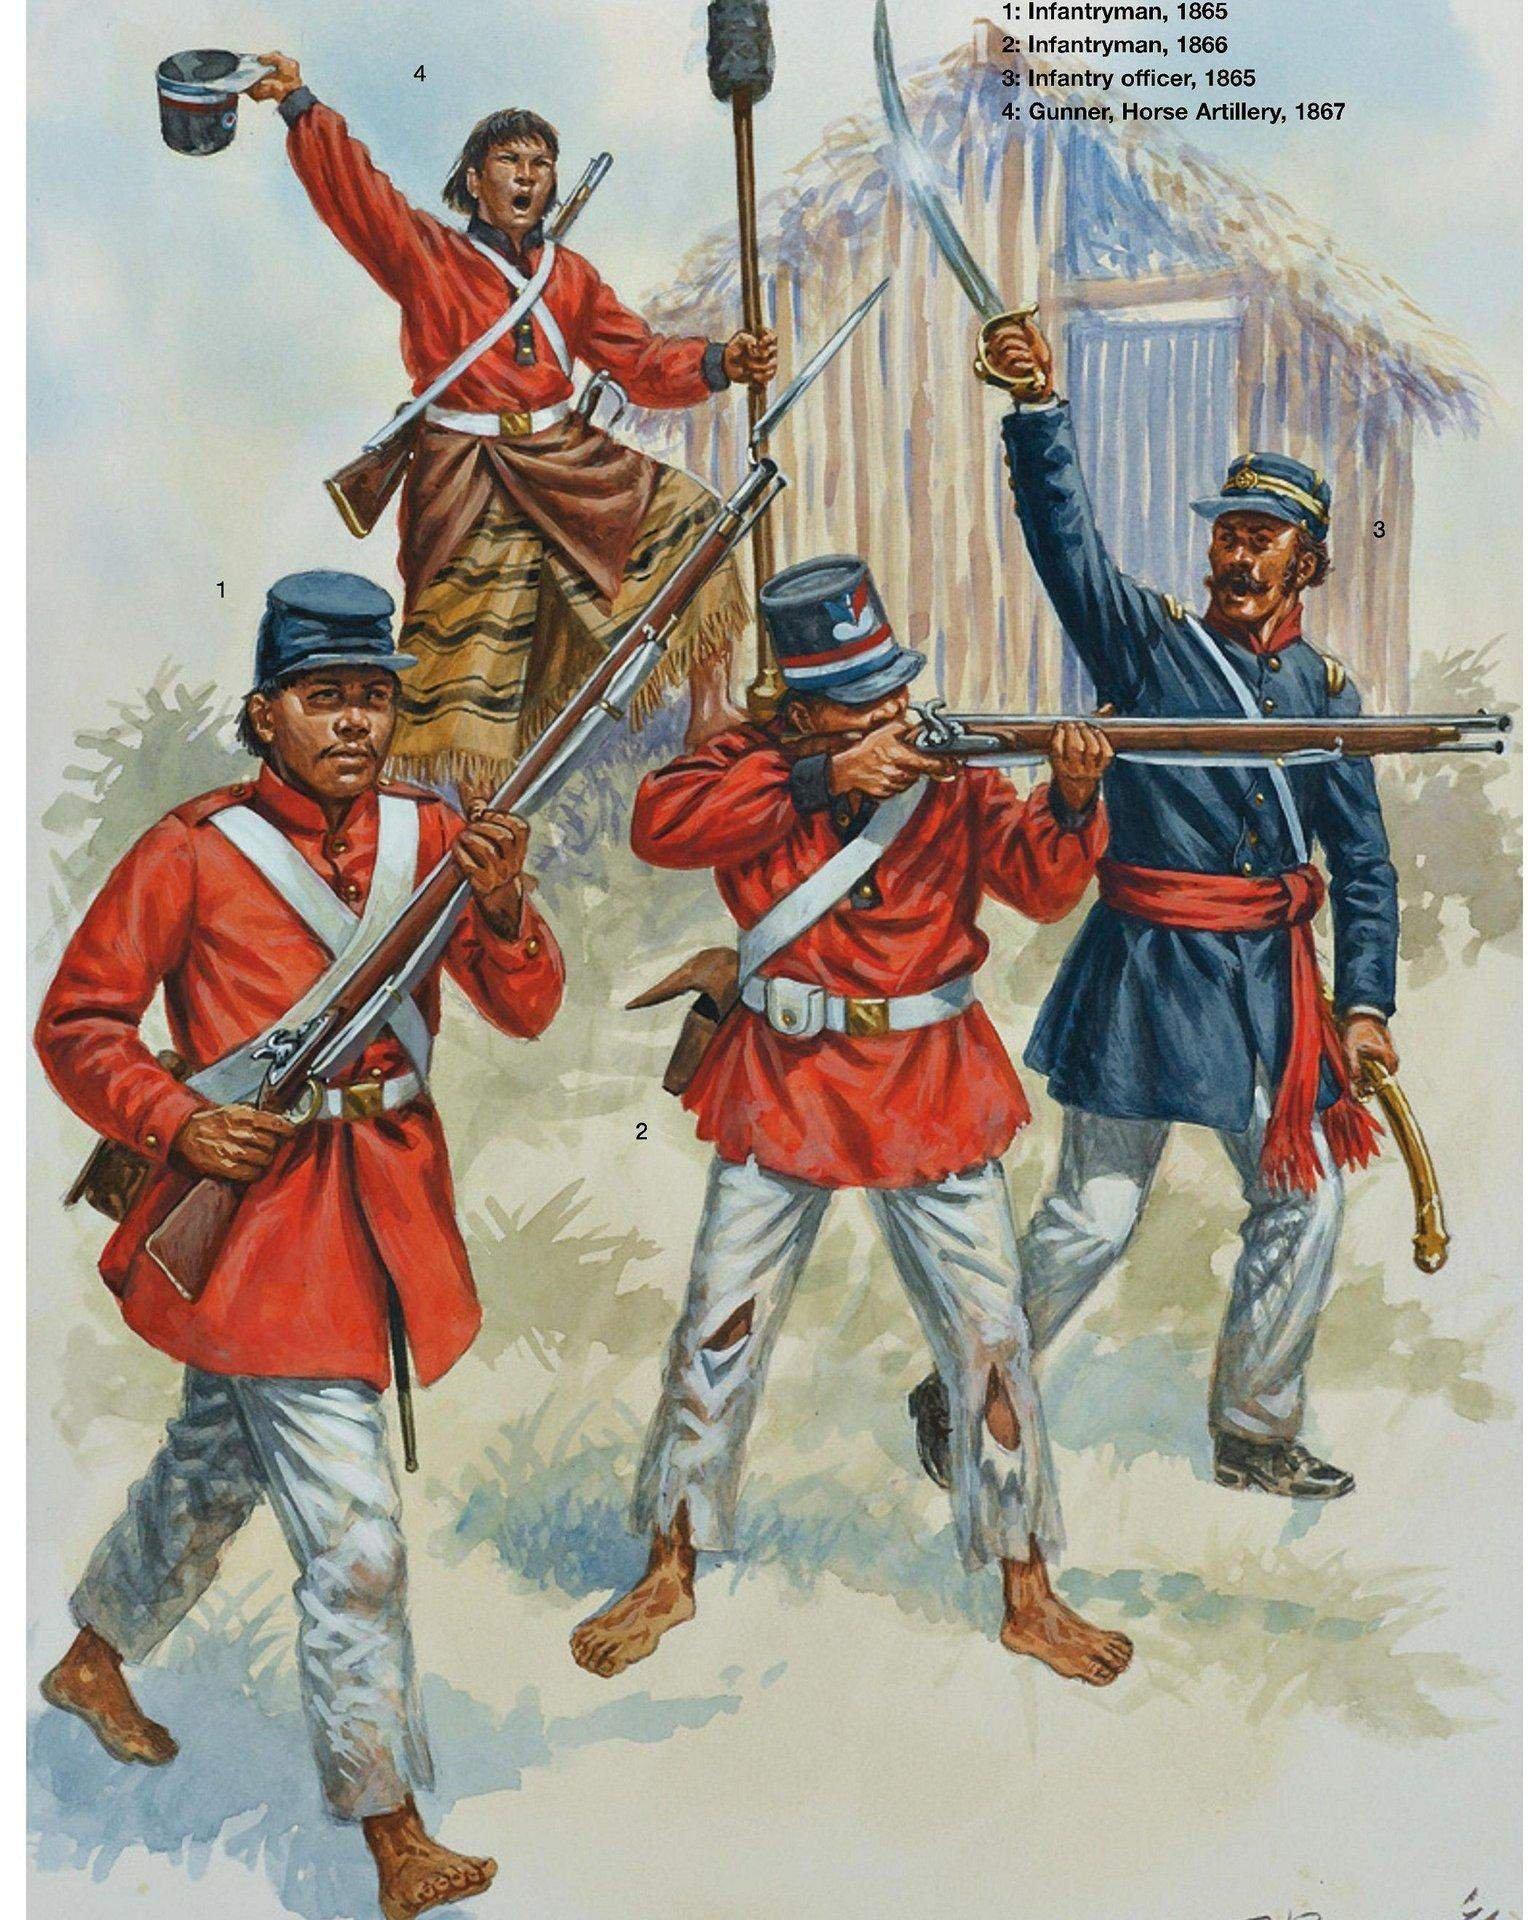 Парагвайская пехота. Художник: Giuseppe Rava